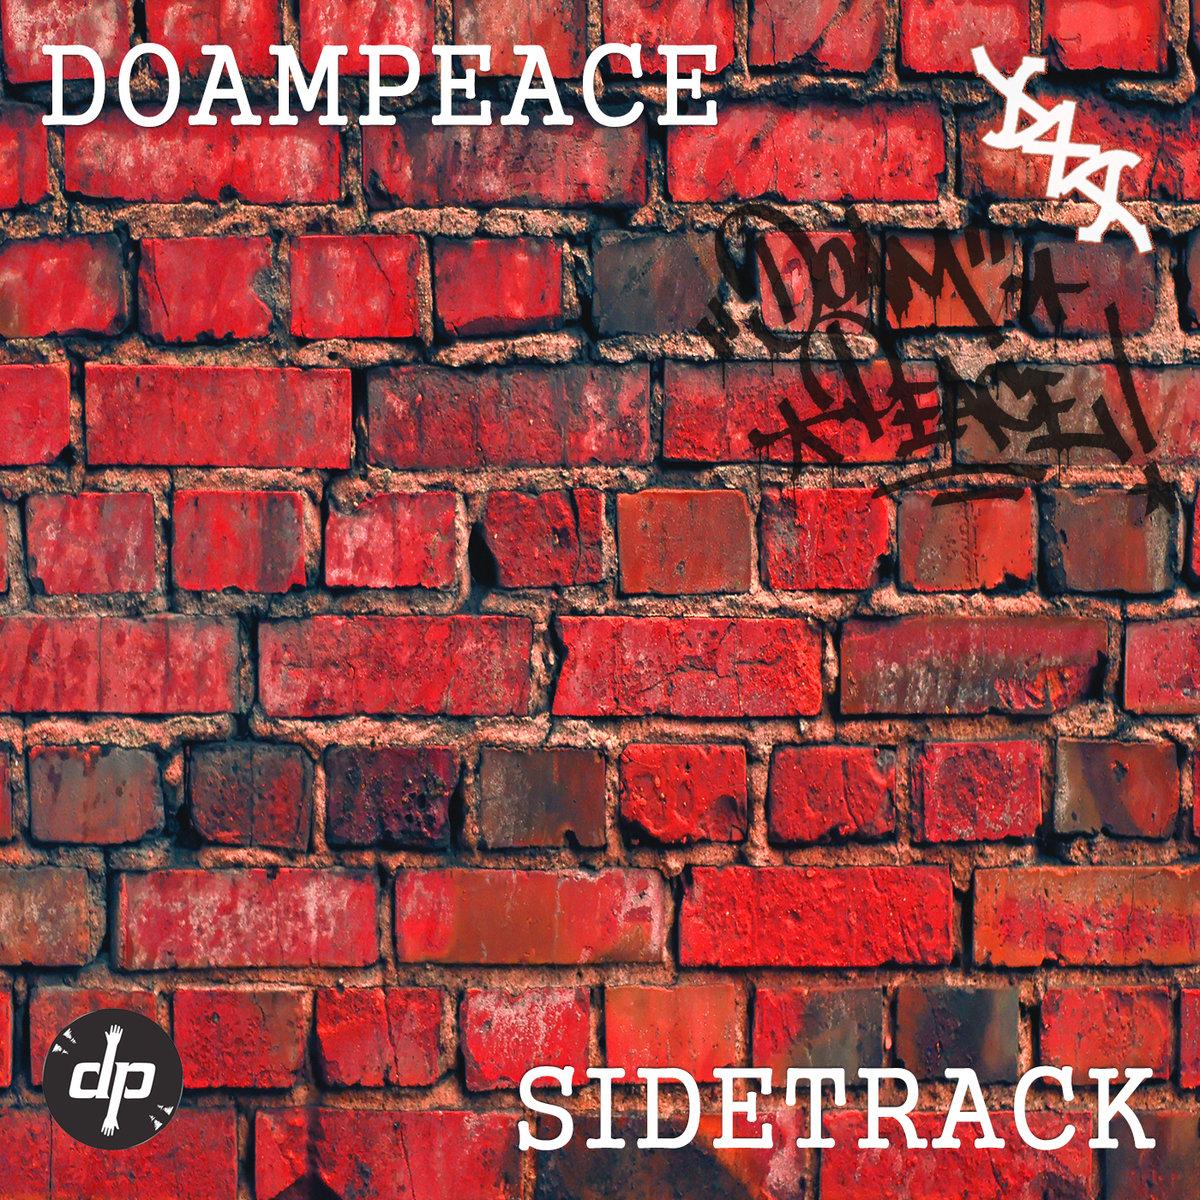 Doampeacedxa_presenta_sidetrack_ep